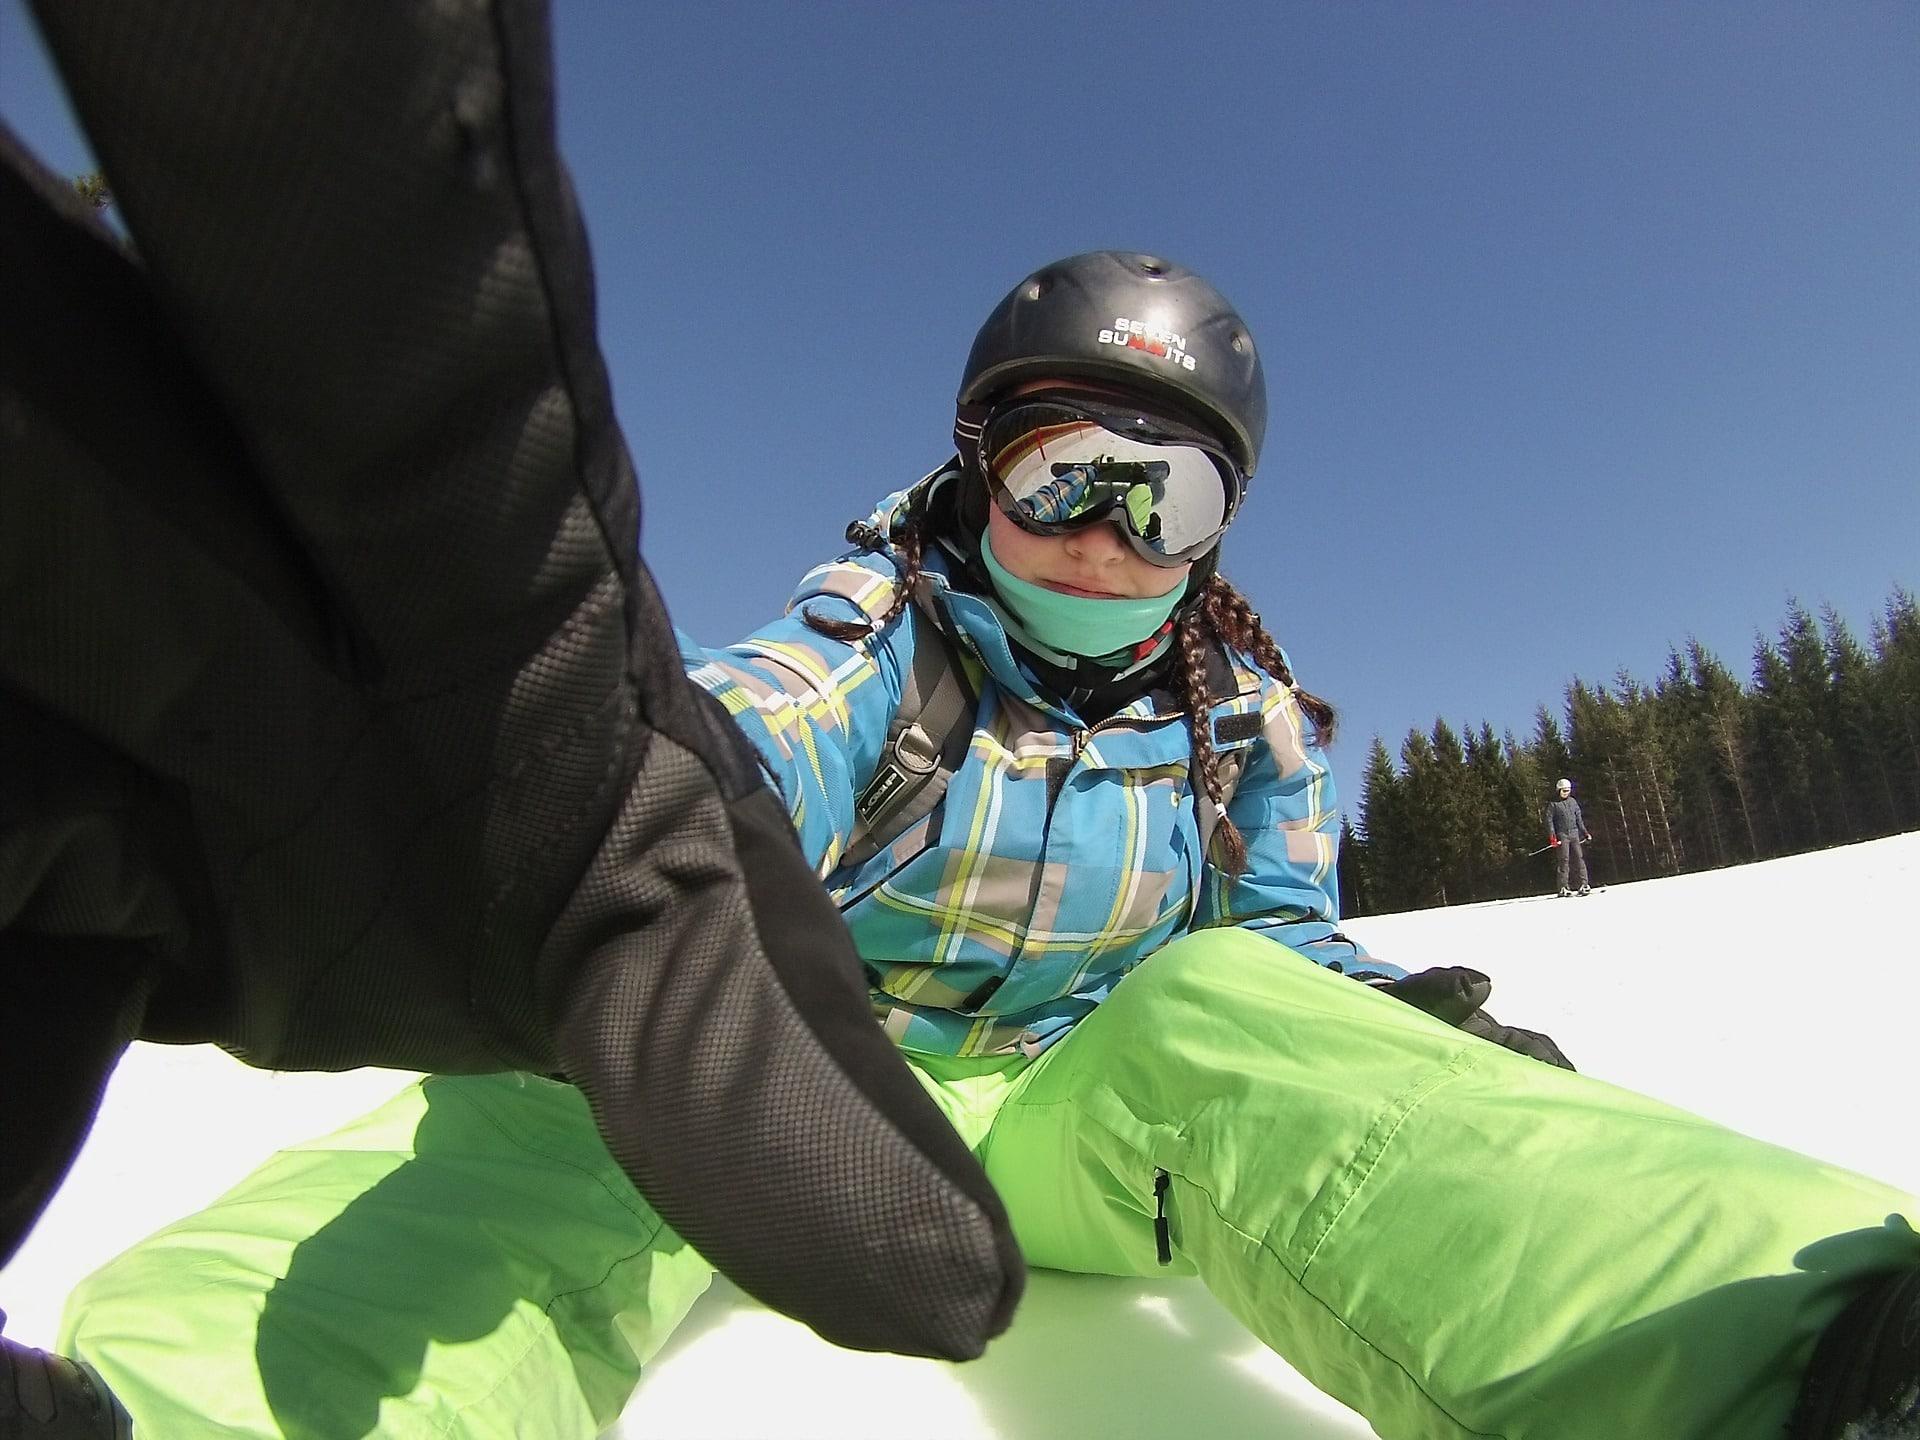 snow ski clothes snowboarding pixabay